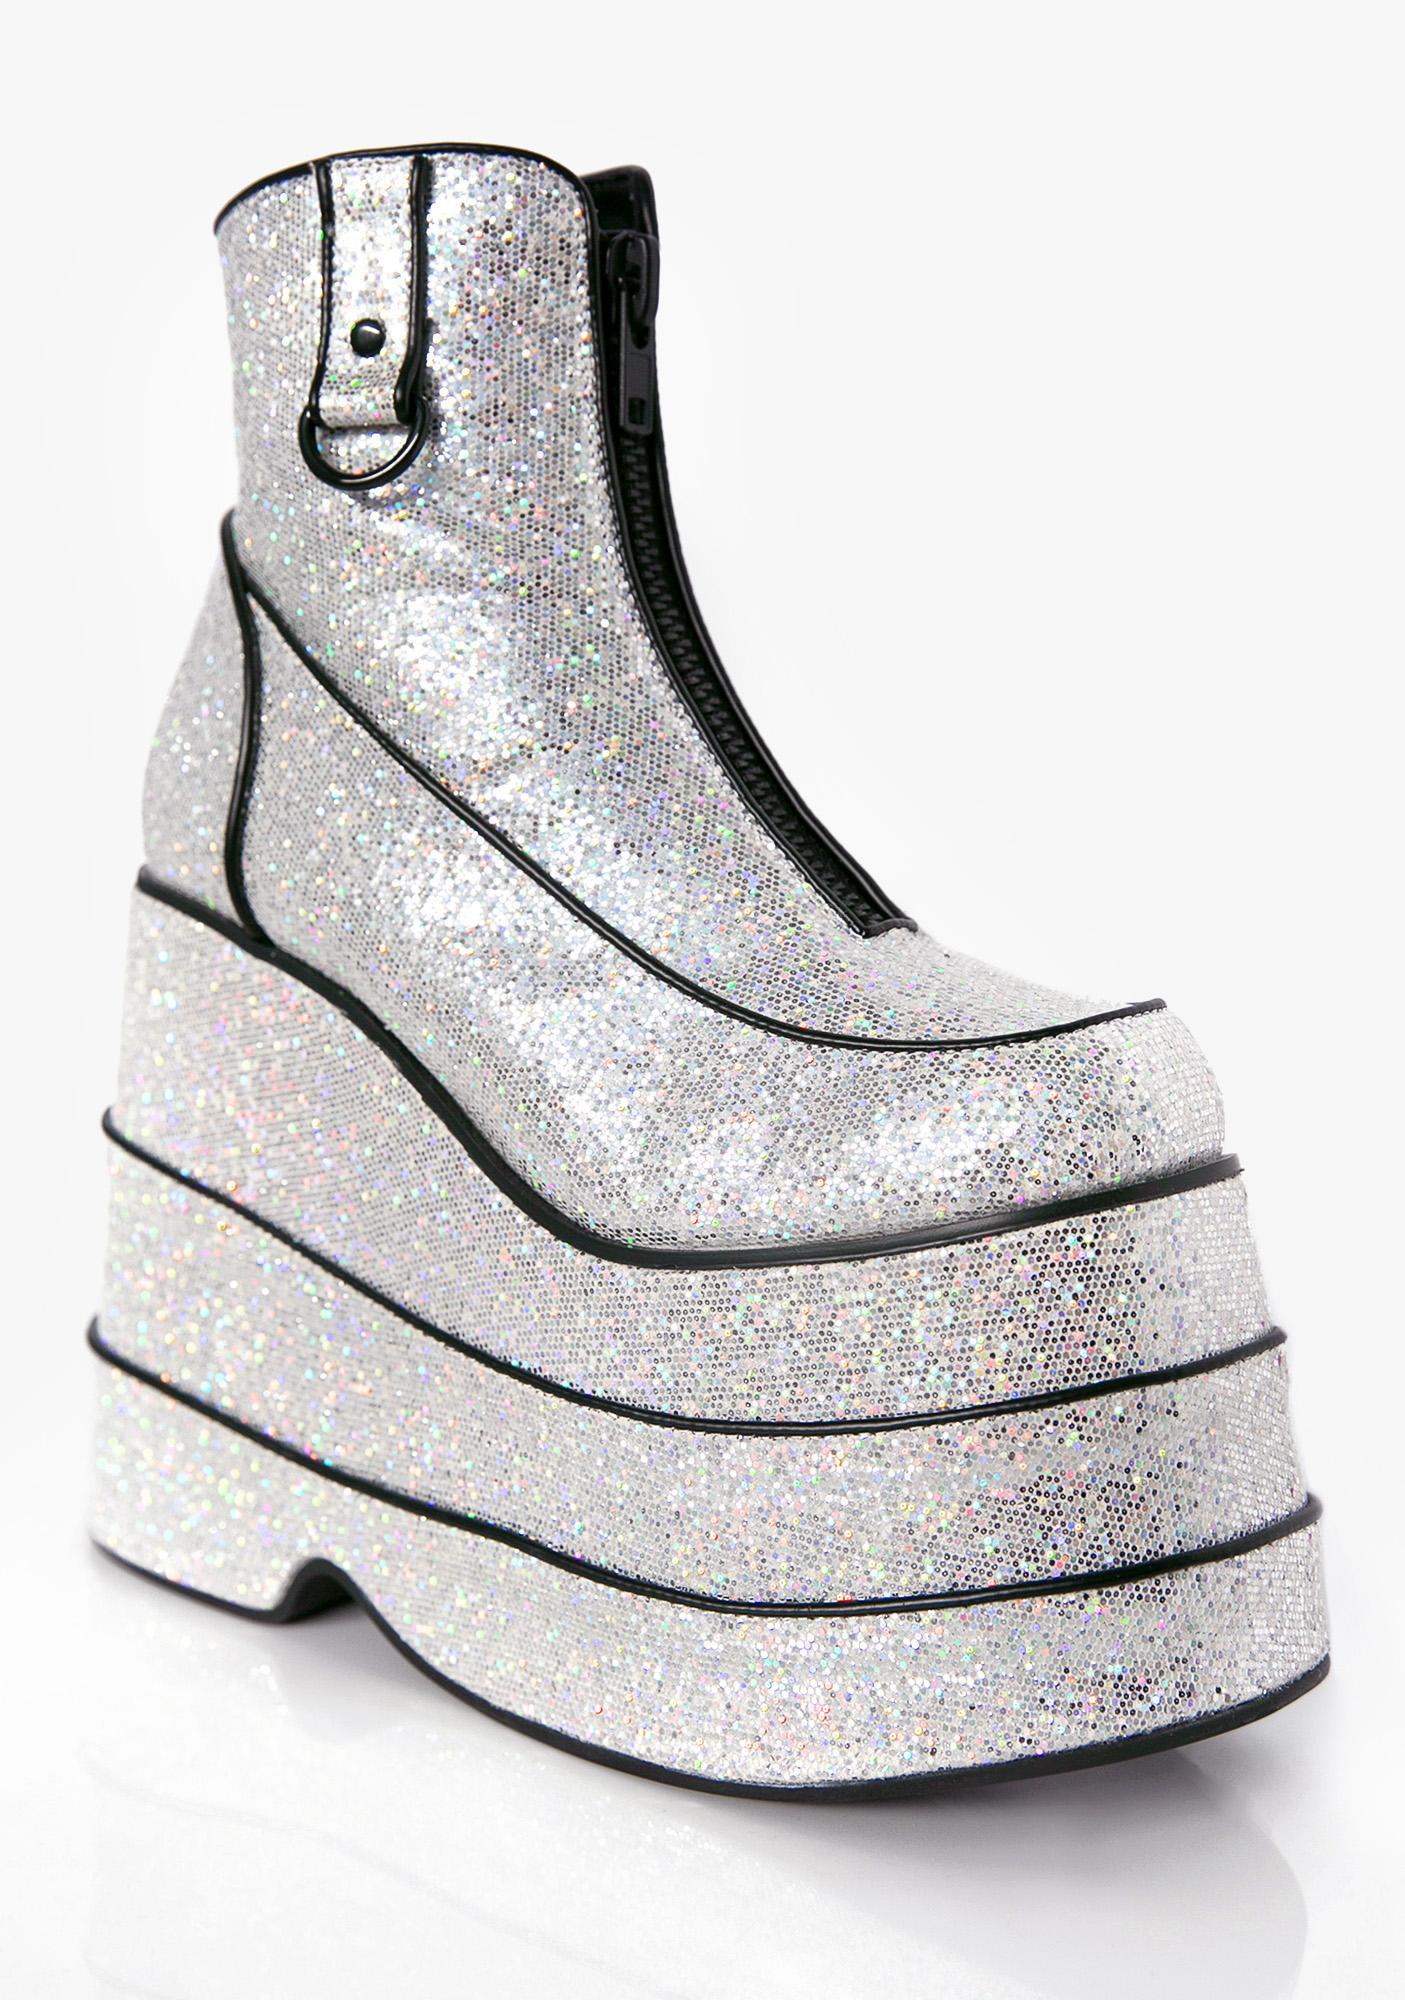 Club Exx Discotheque Glitter Platform Boots